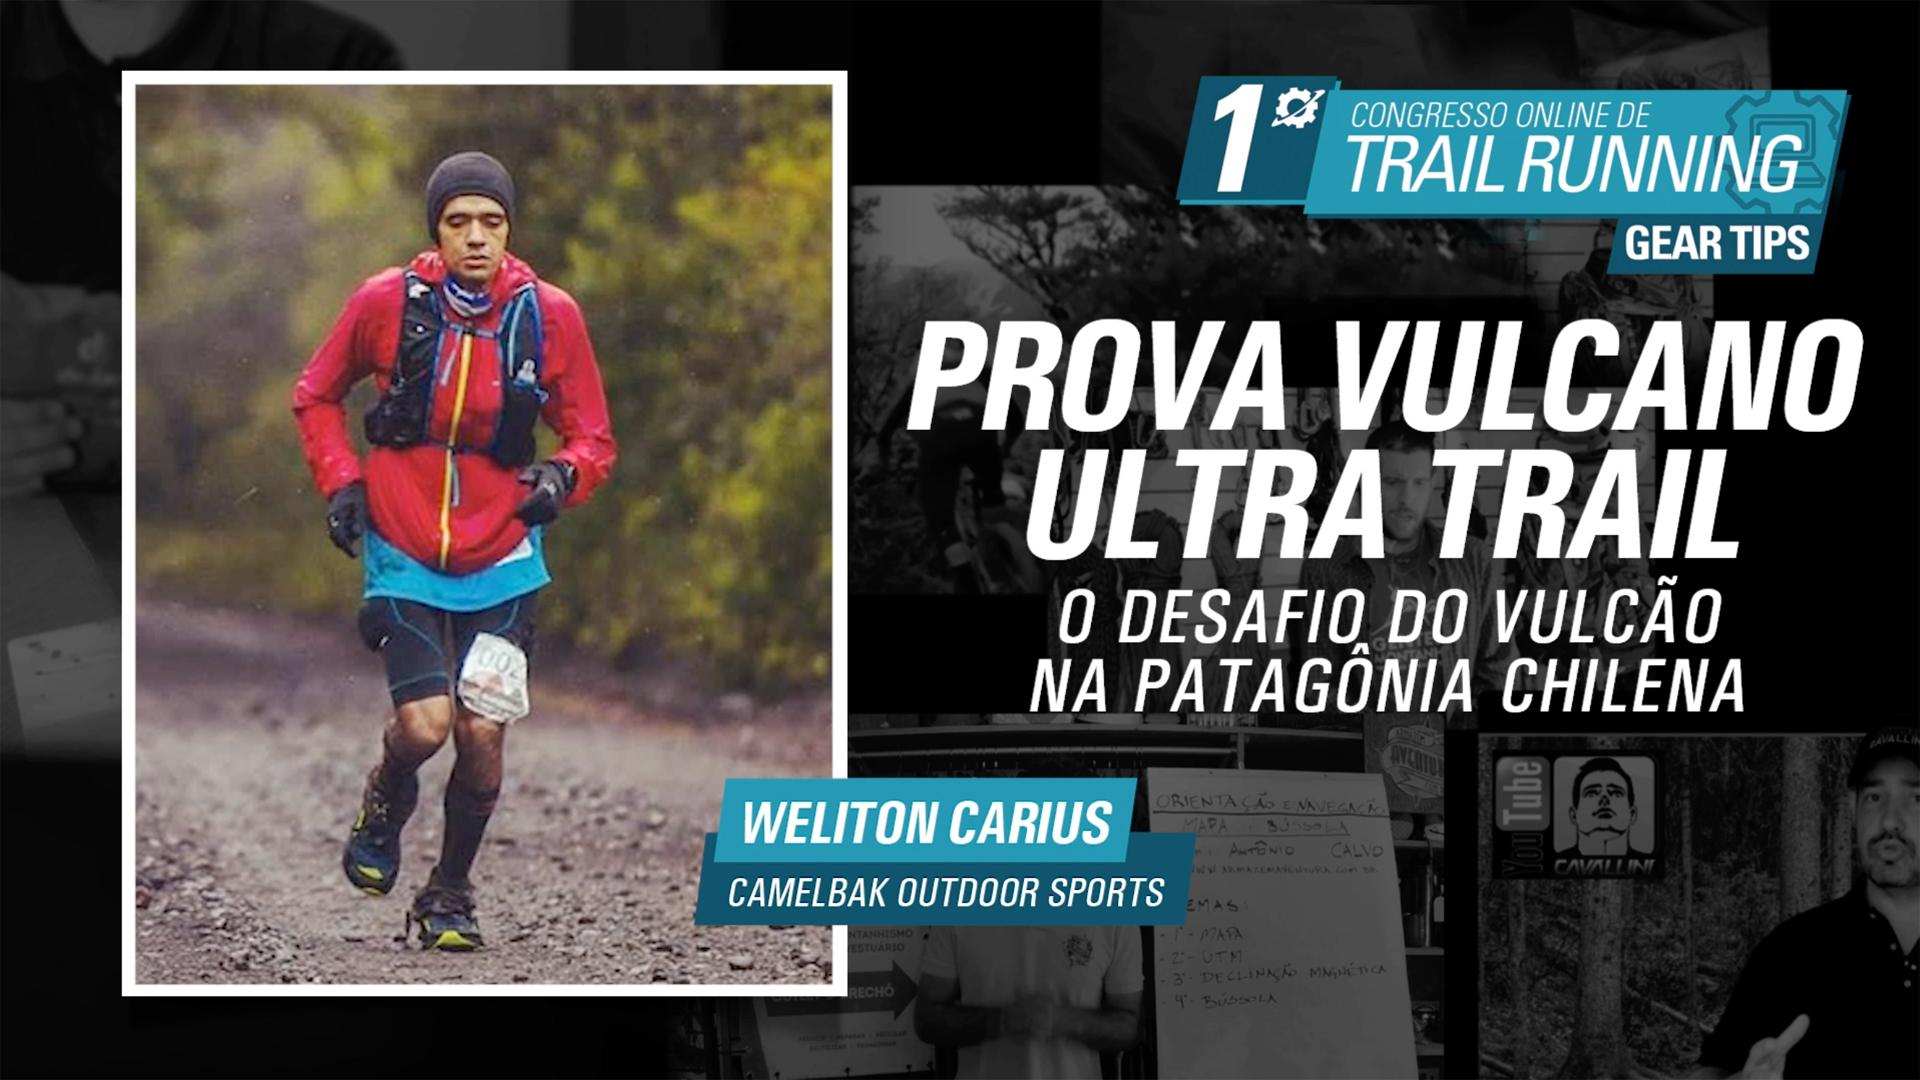 Vulcano Ultra Trail - Weliton Carius